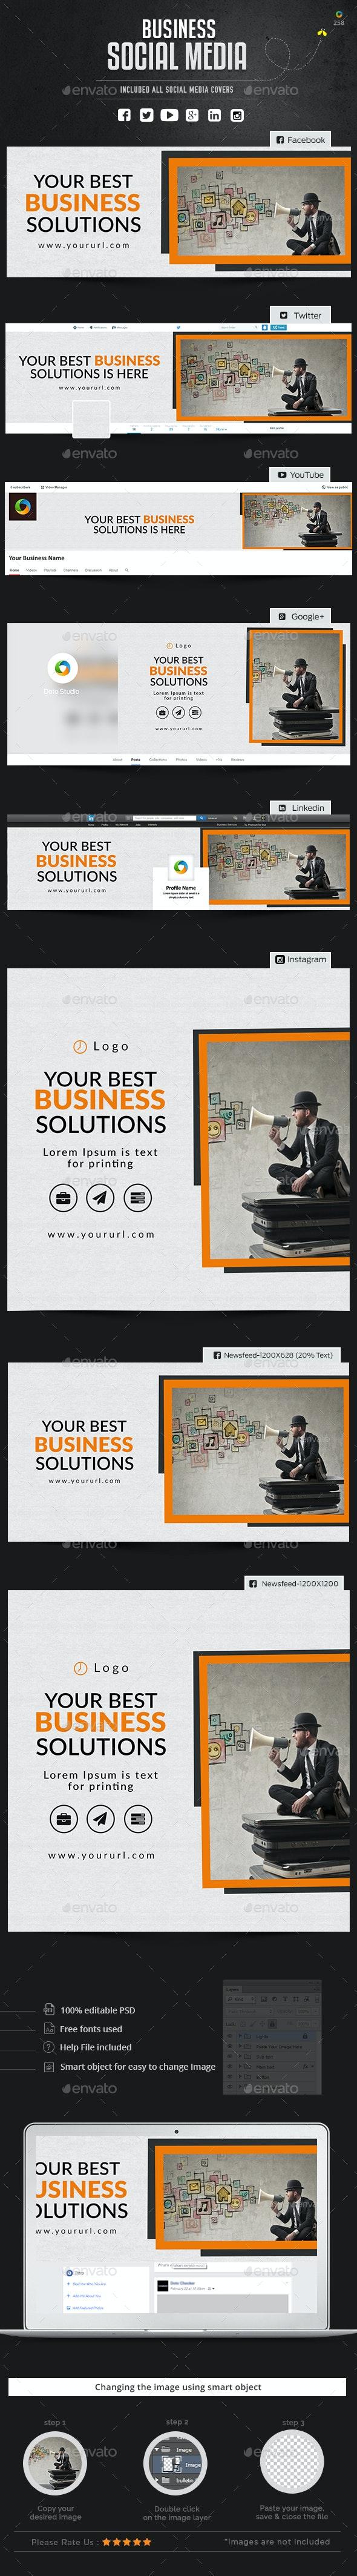 Business Social Media Package - Miscellaneous Social Media